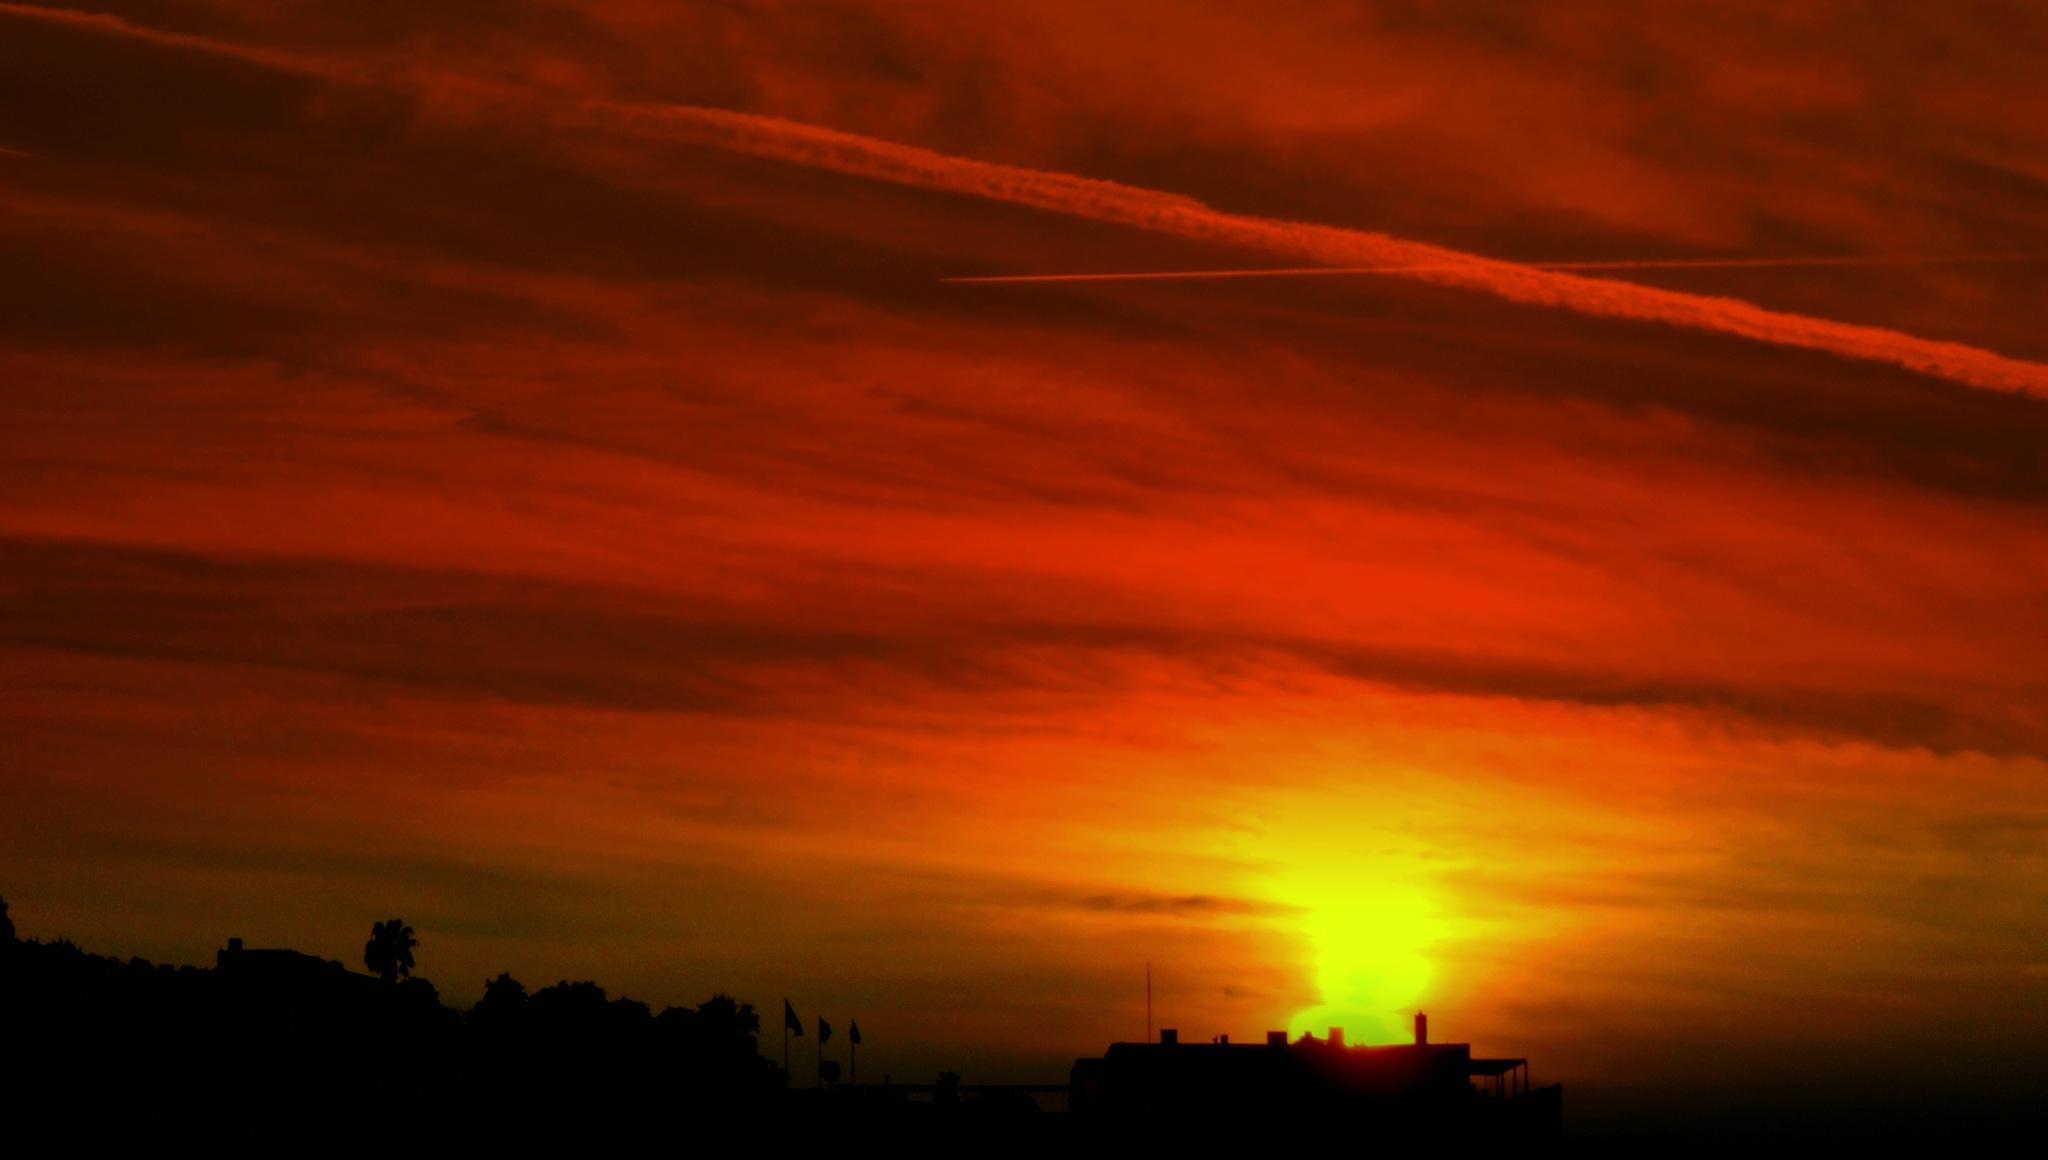 FORGOTTEN SUNSETS 104 by Akin Saner